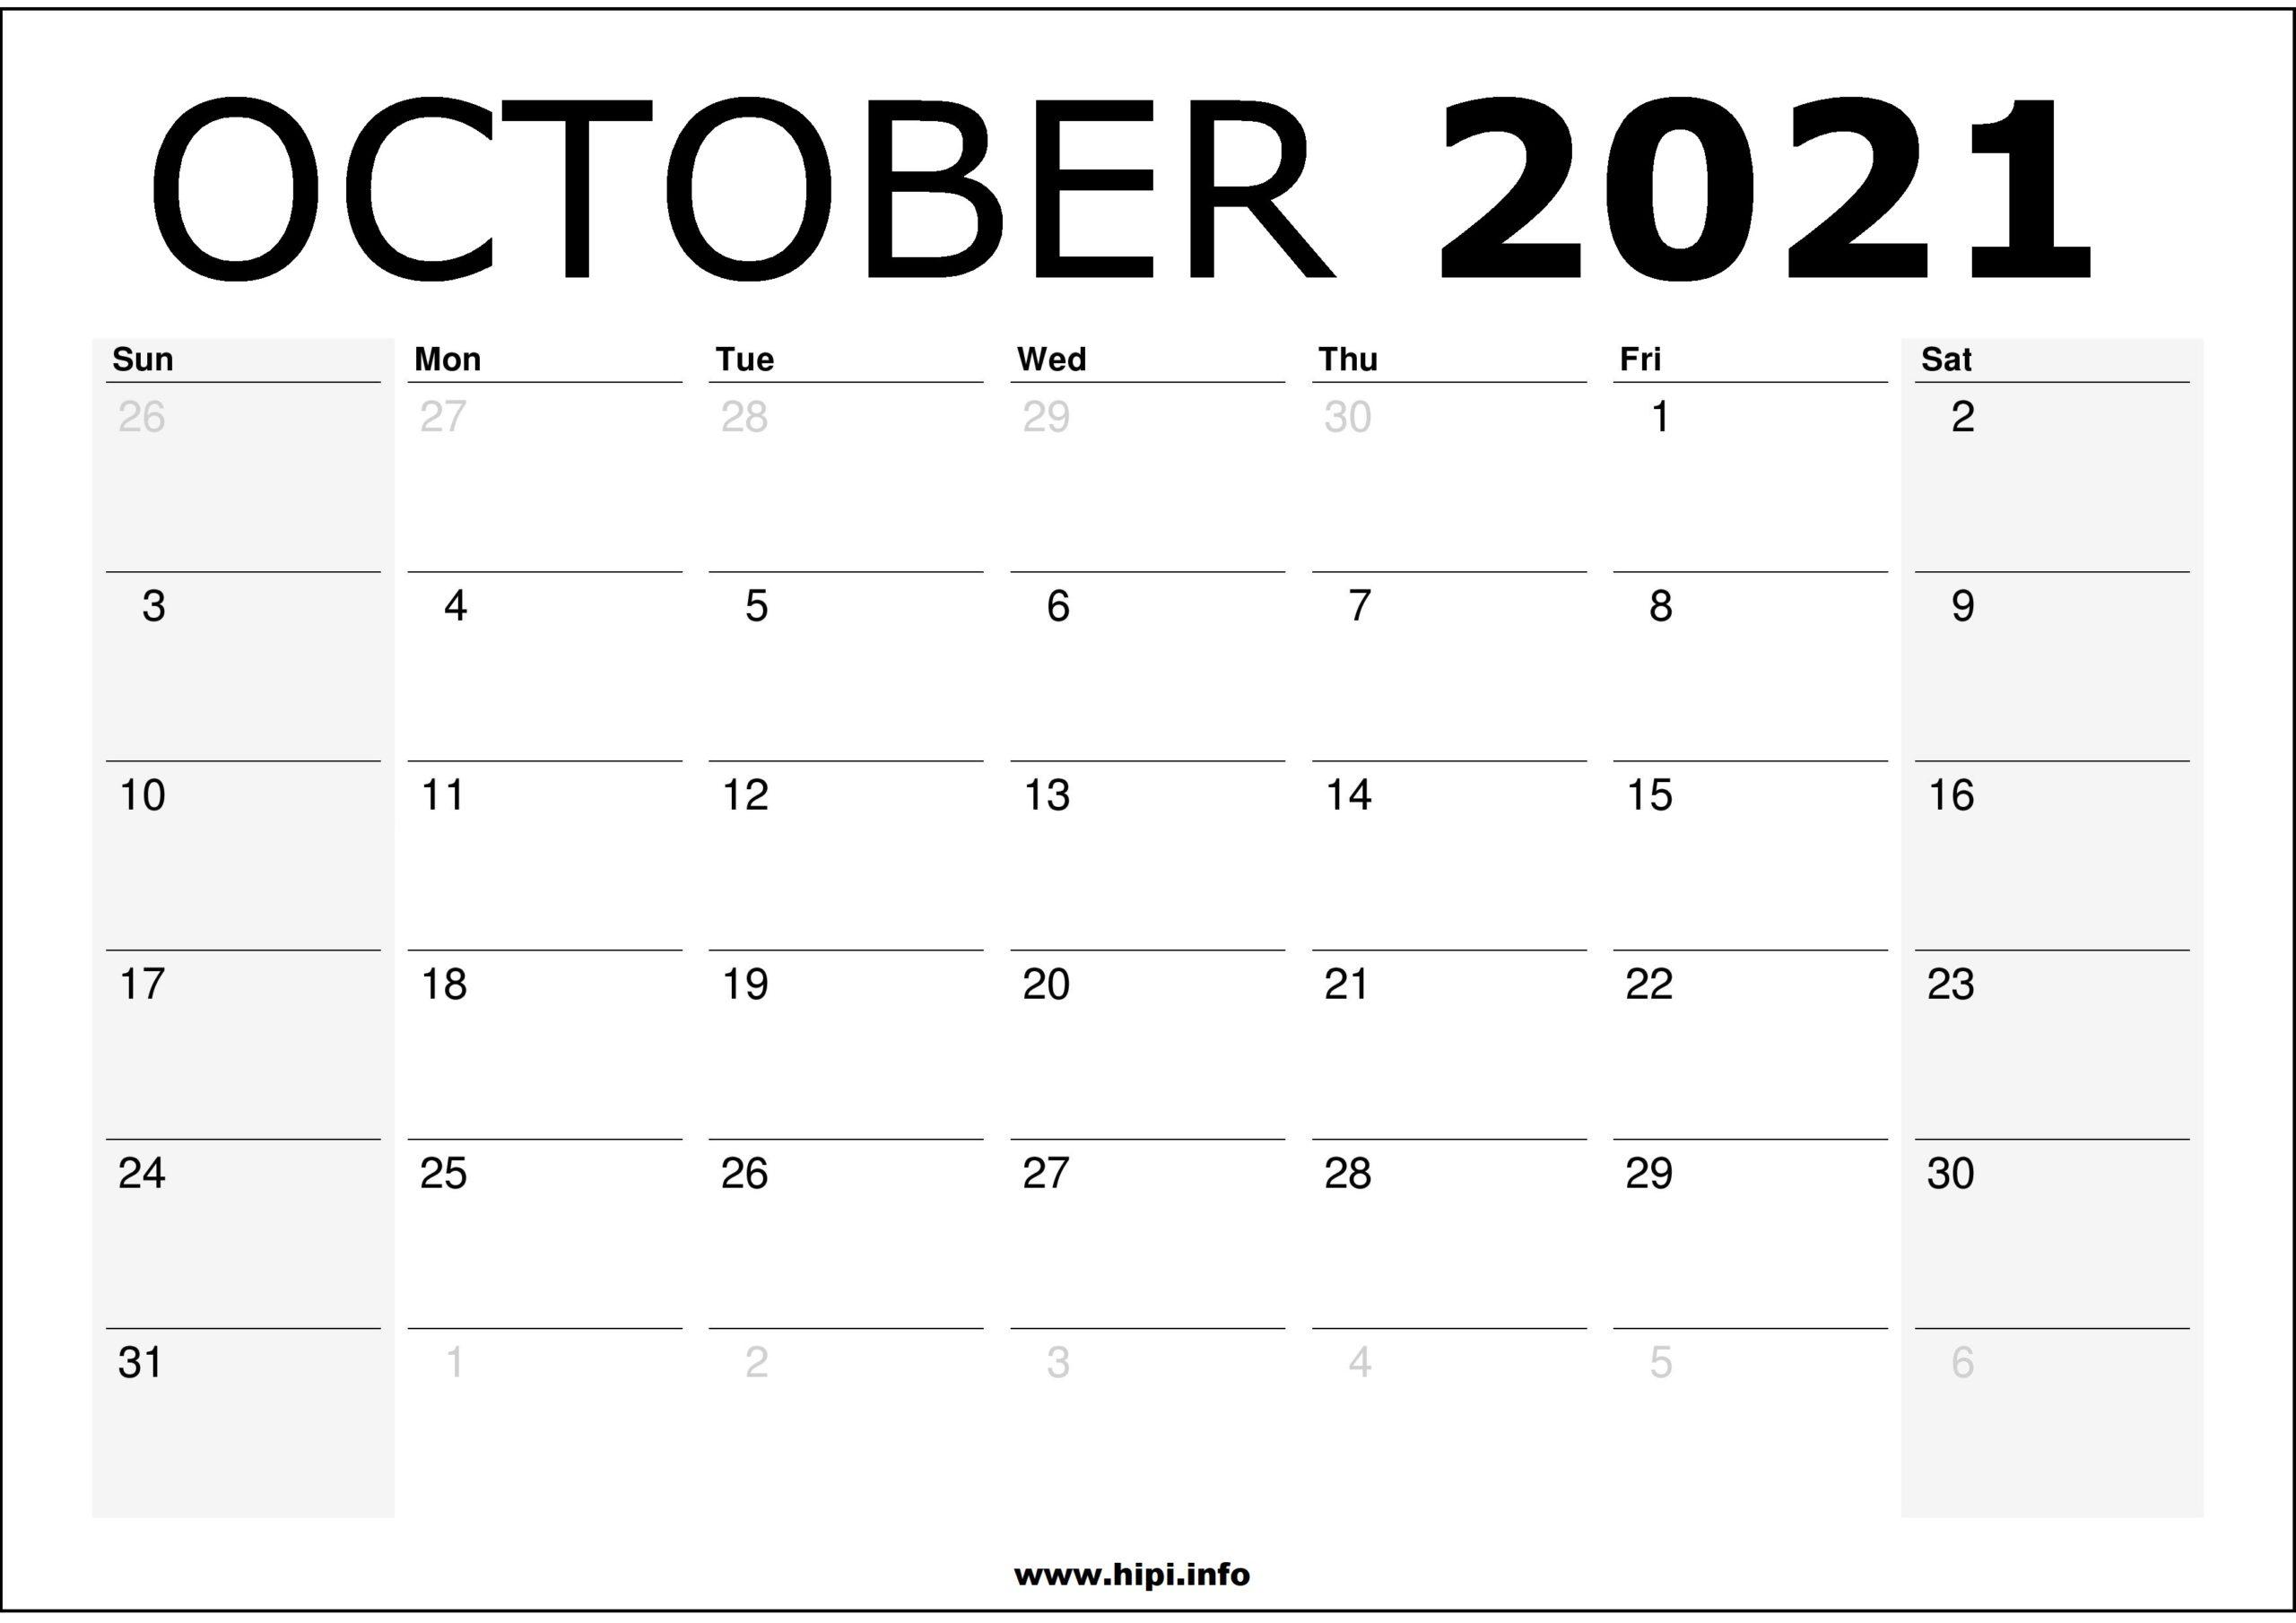 October 2021 Calendar Printable - Monthly Calendar Free